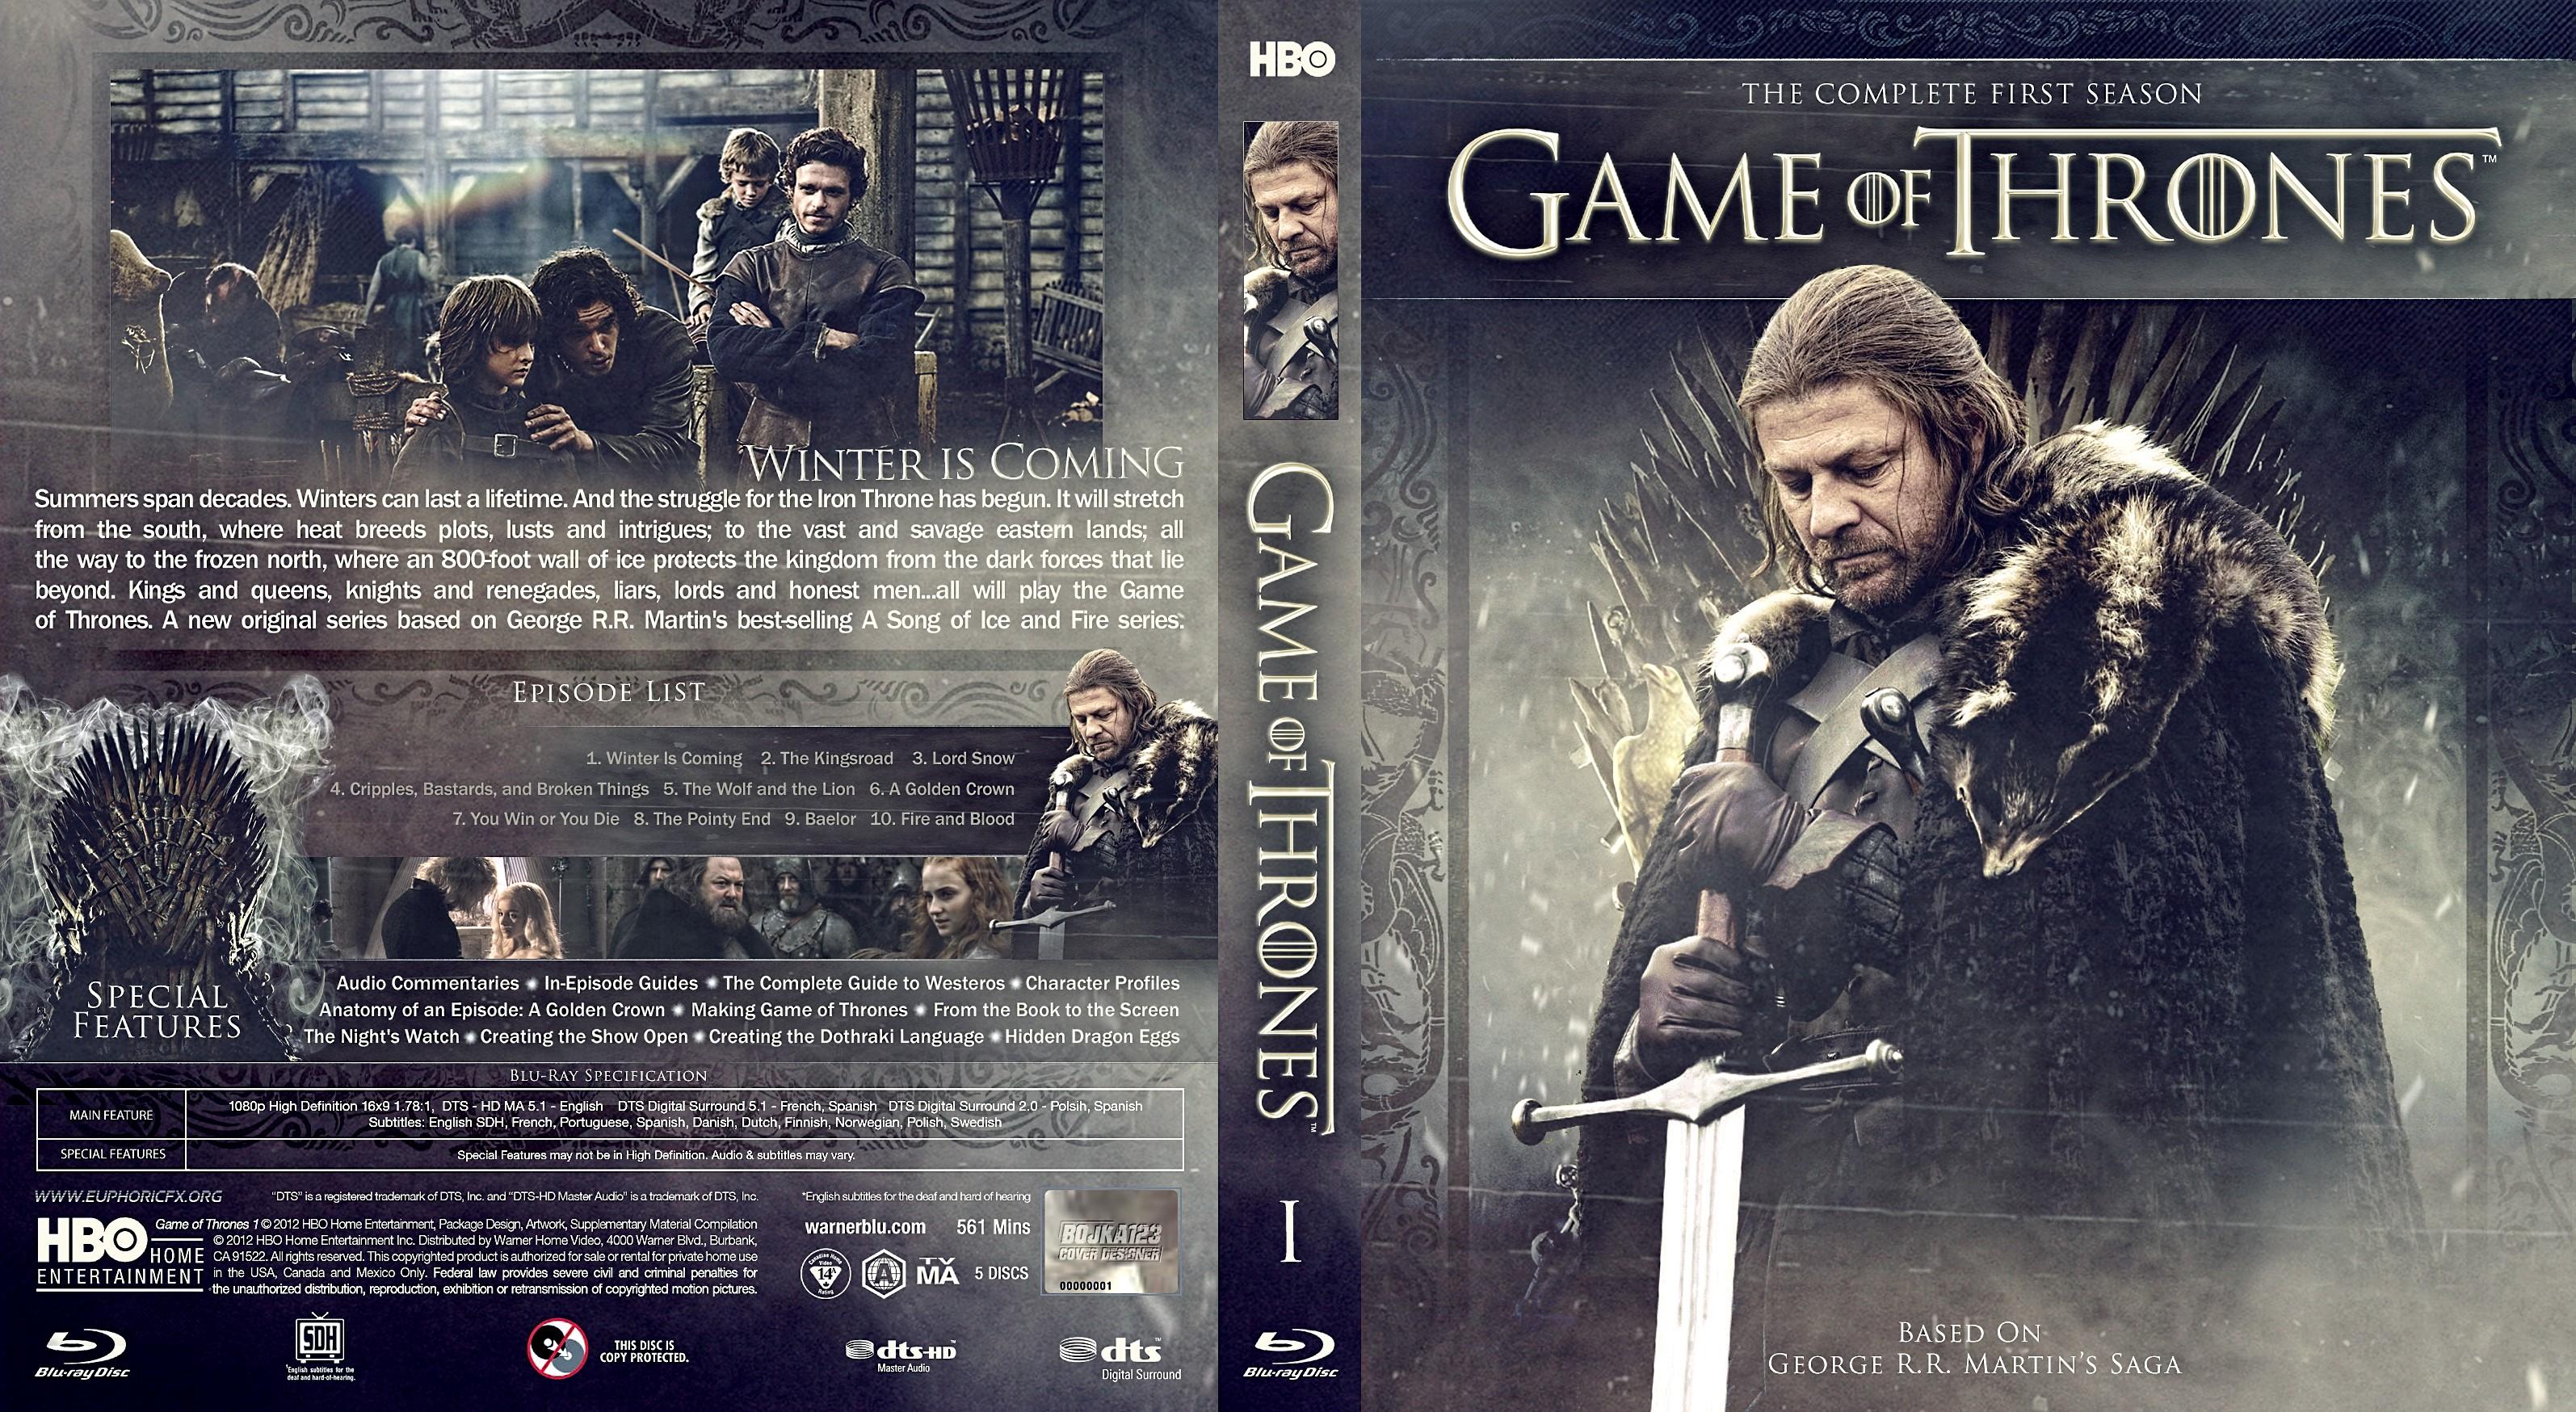 Game Of Thrones Season 2 Subtitles English Dothraki idea gallery